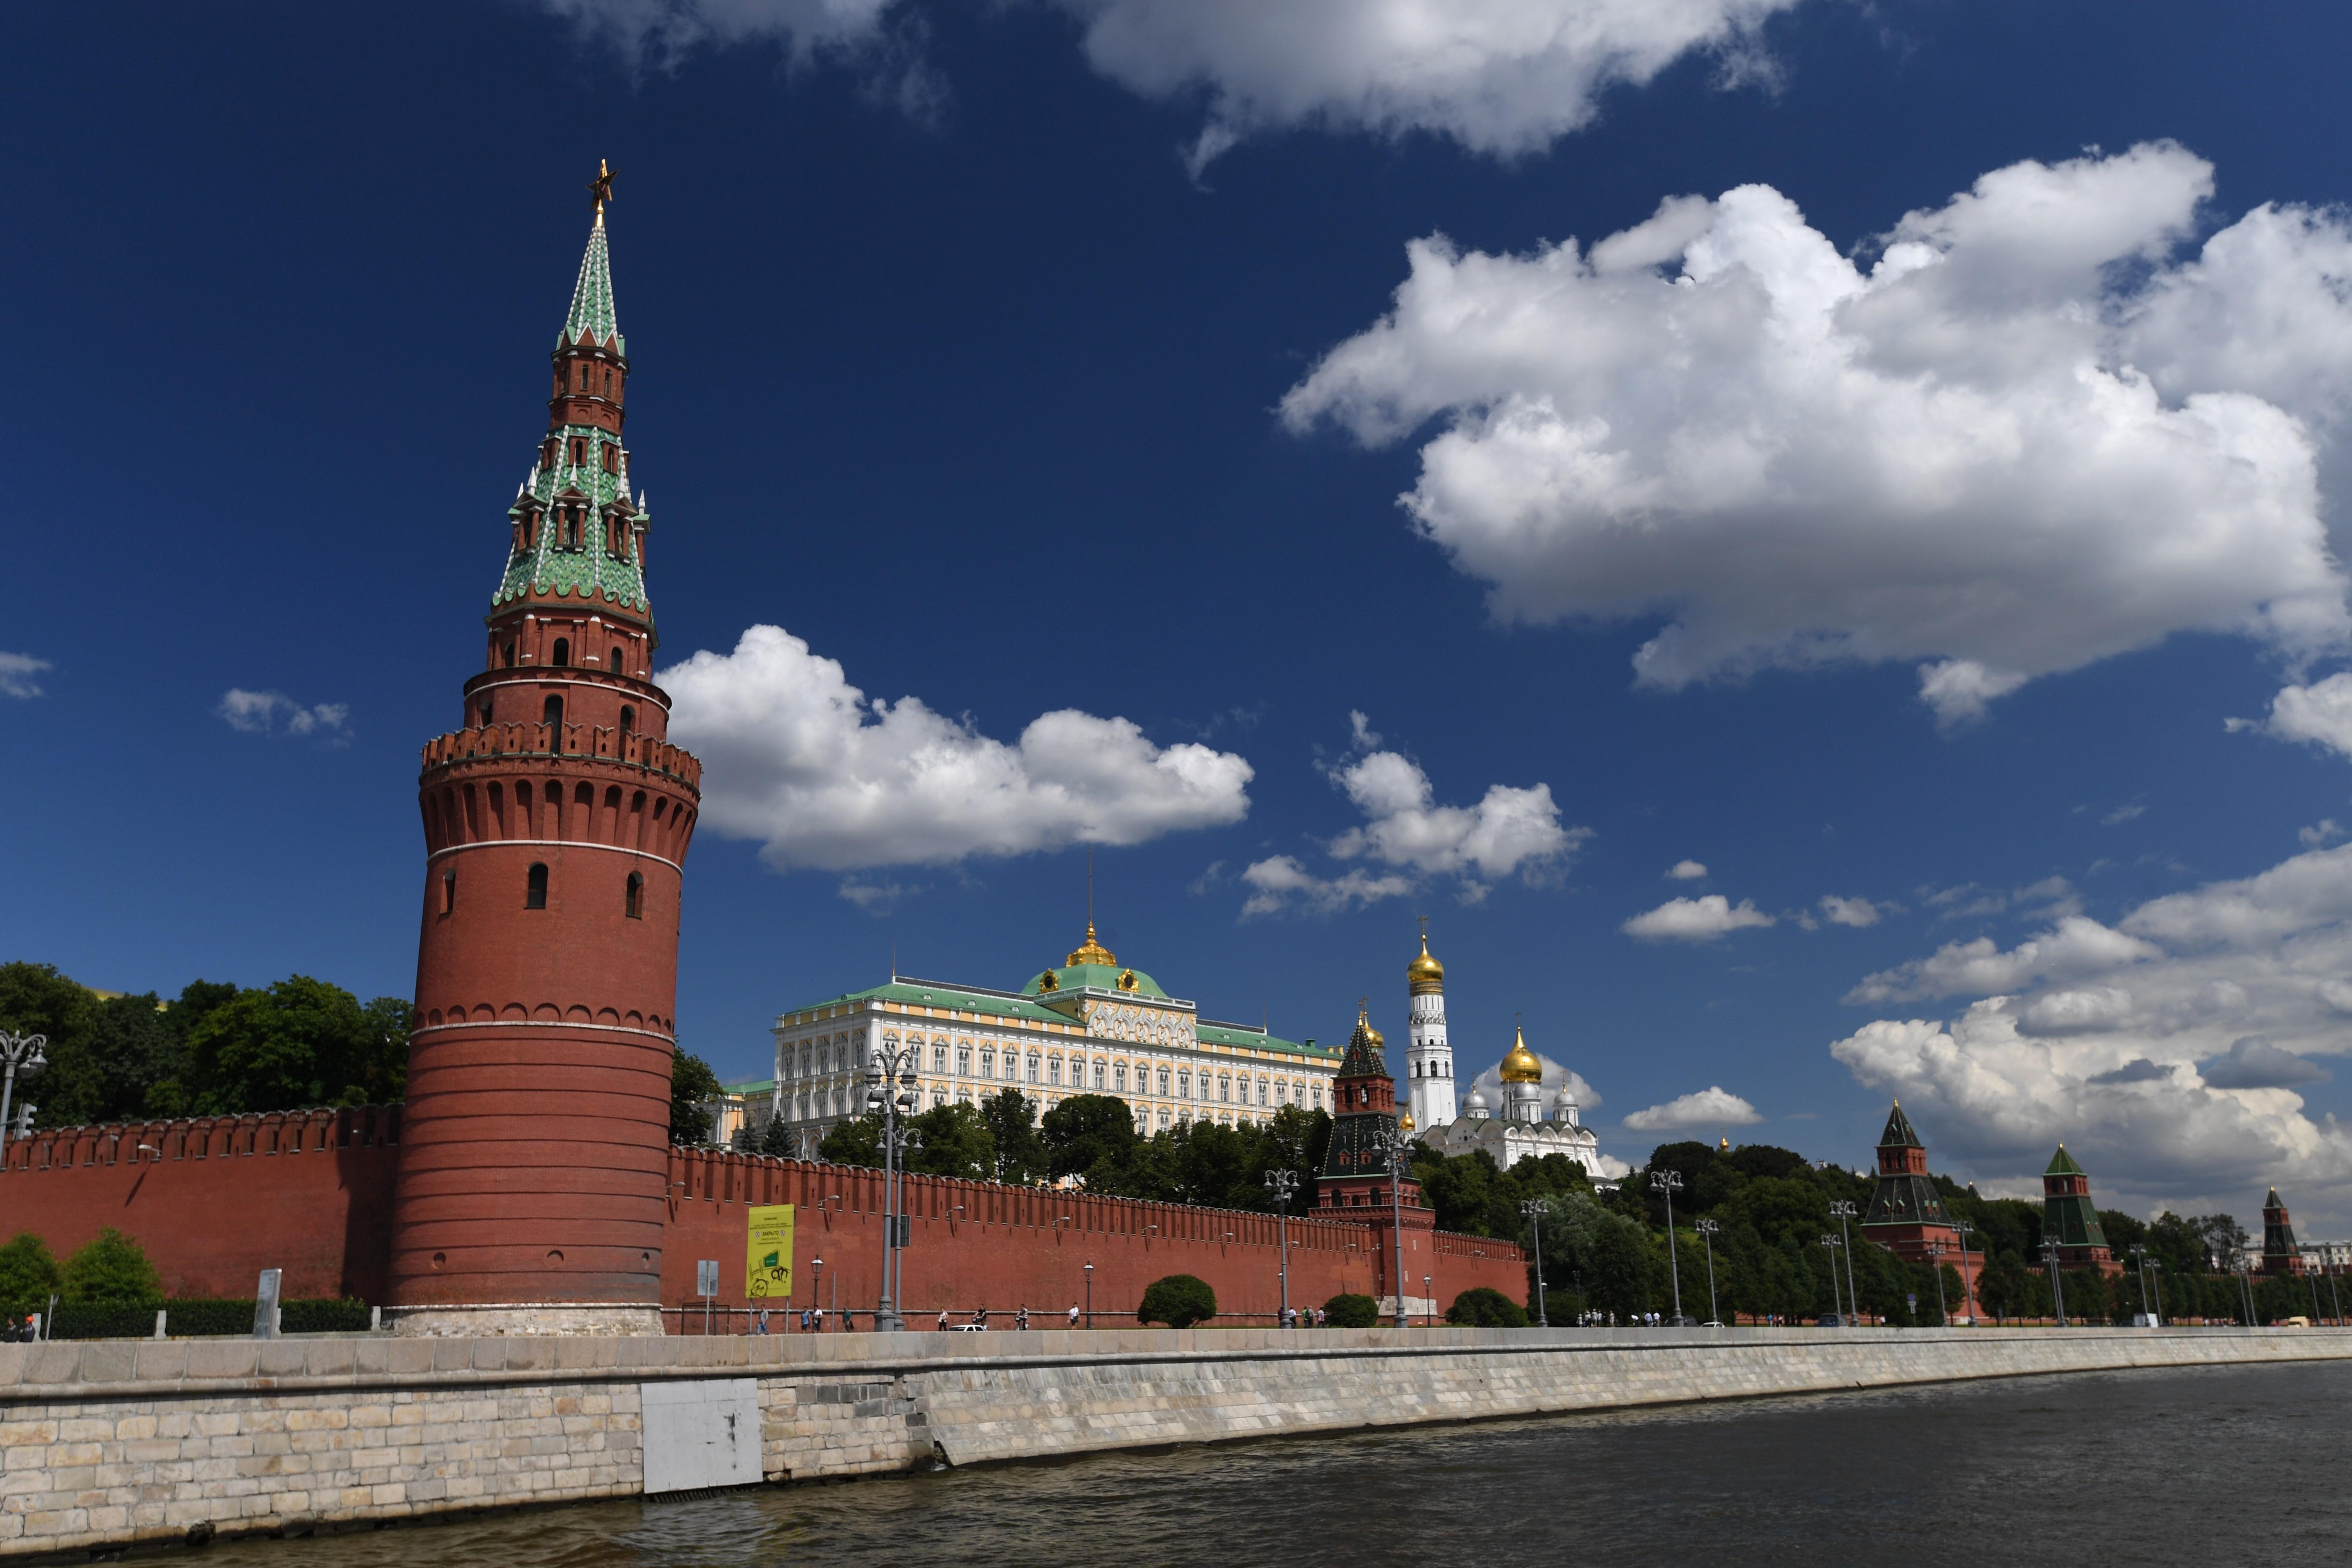 <p>Фото: &copy;РИА Новости/Владимир Вяткин</p>